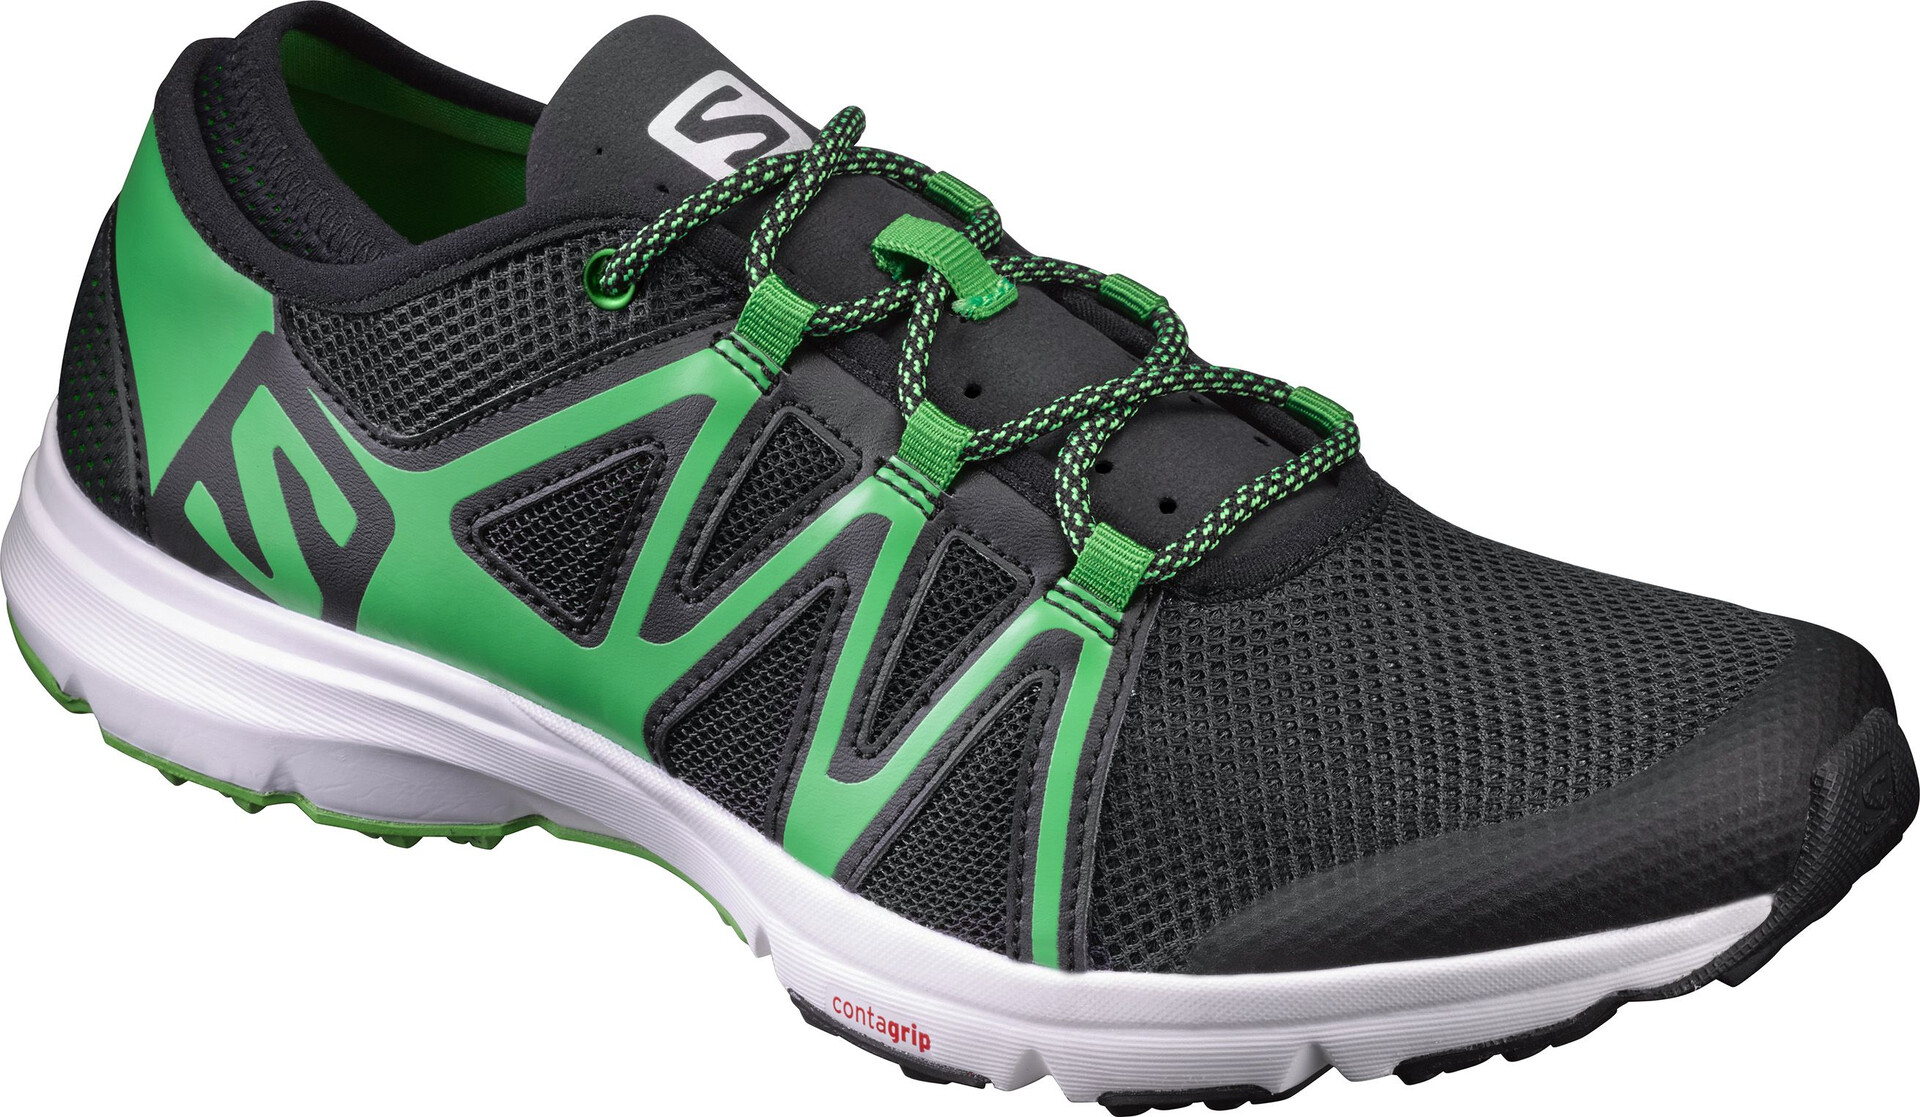 CAMPZ Swift Chaussures Salomon vertnoir sur Crossamphibian Homme CYw65vx